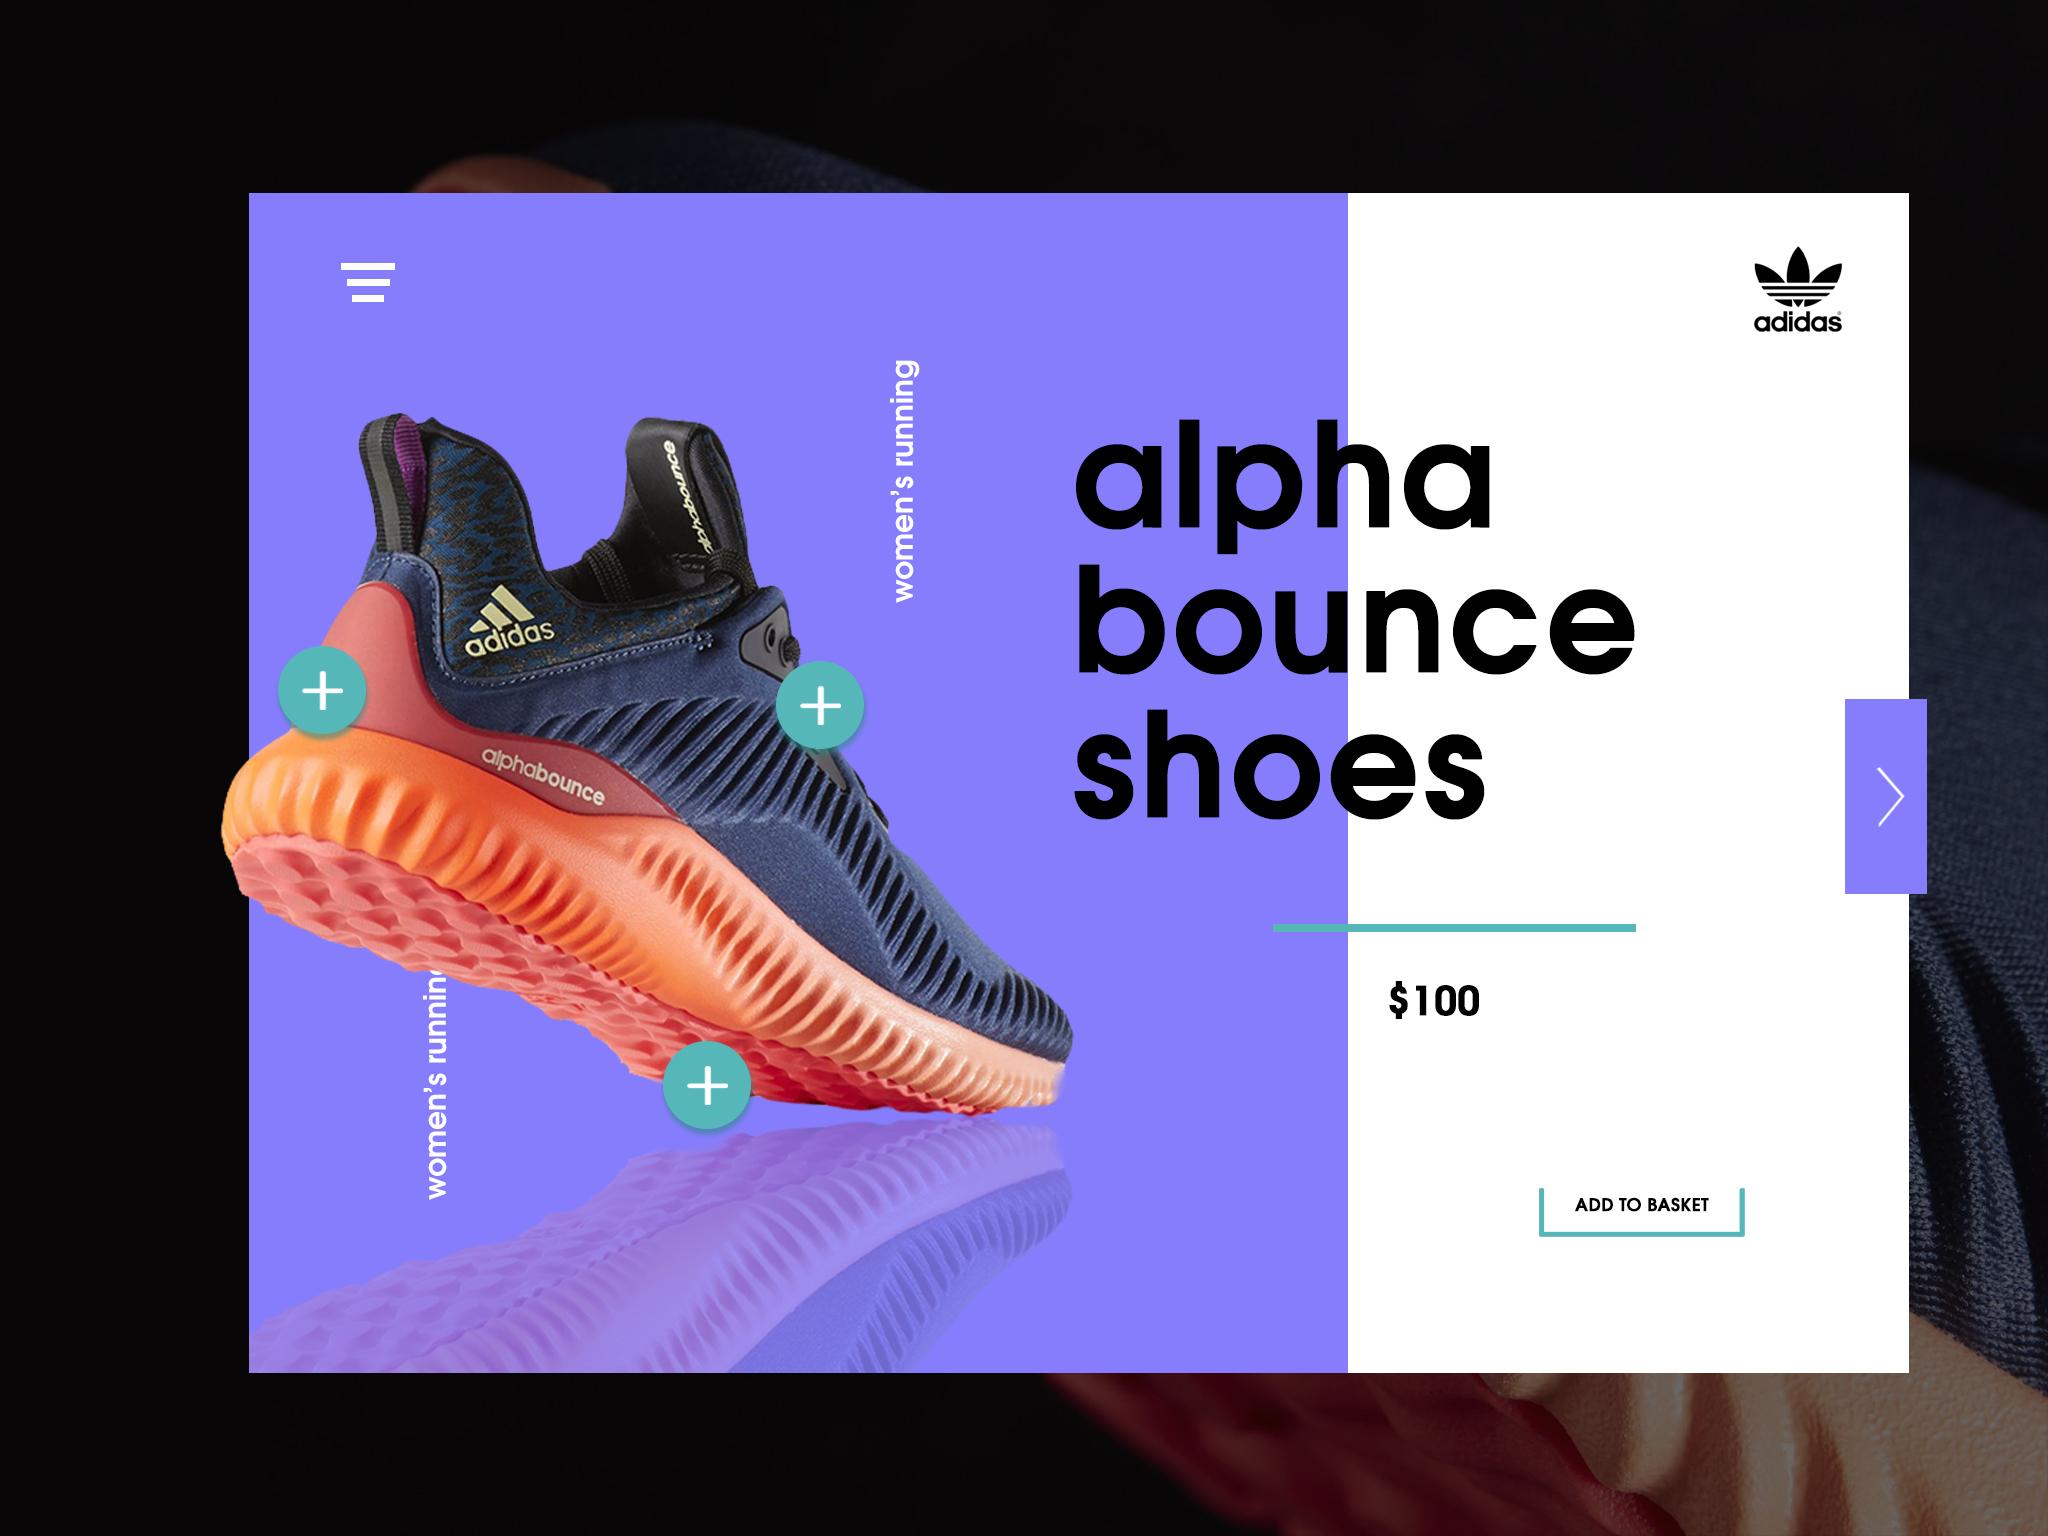 Adidas Single Item E-Commerce